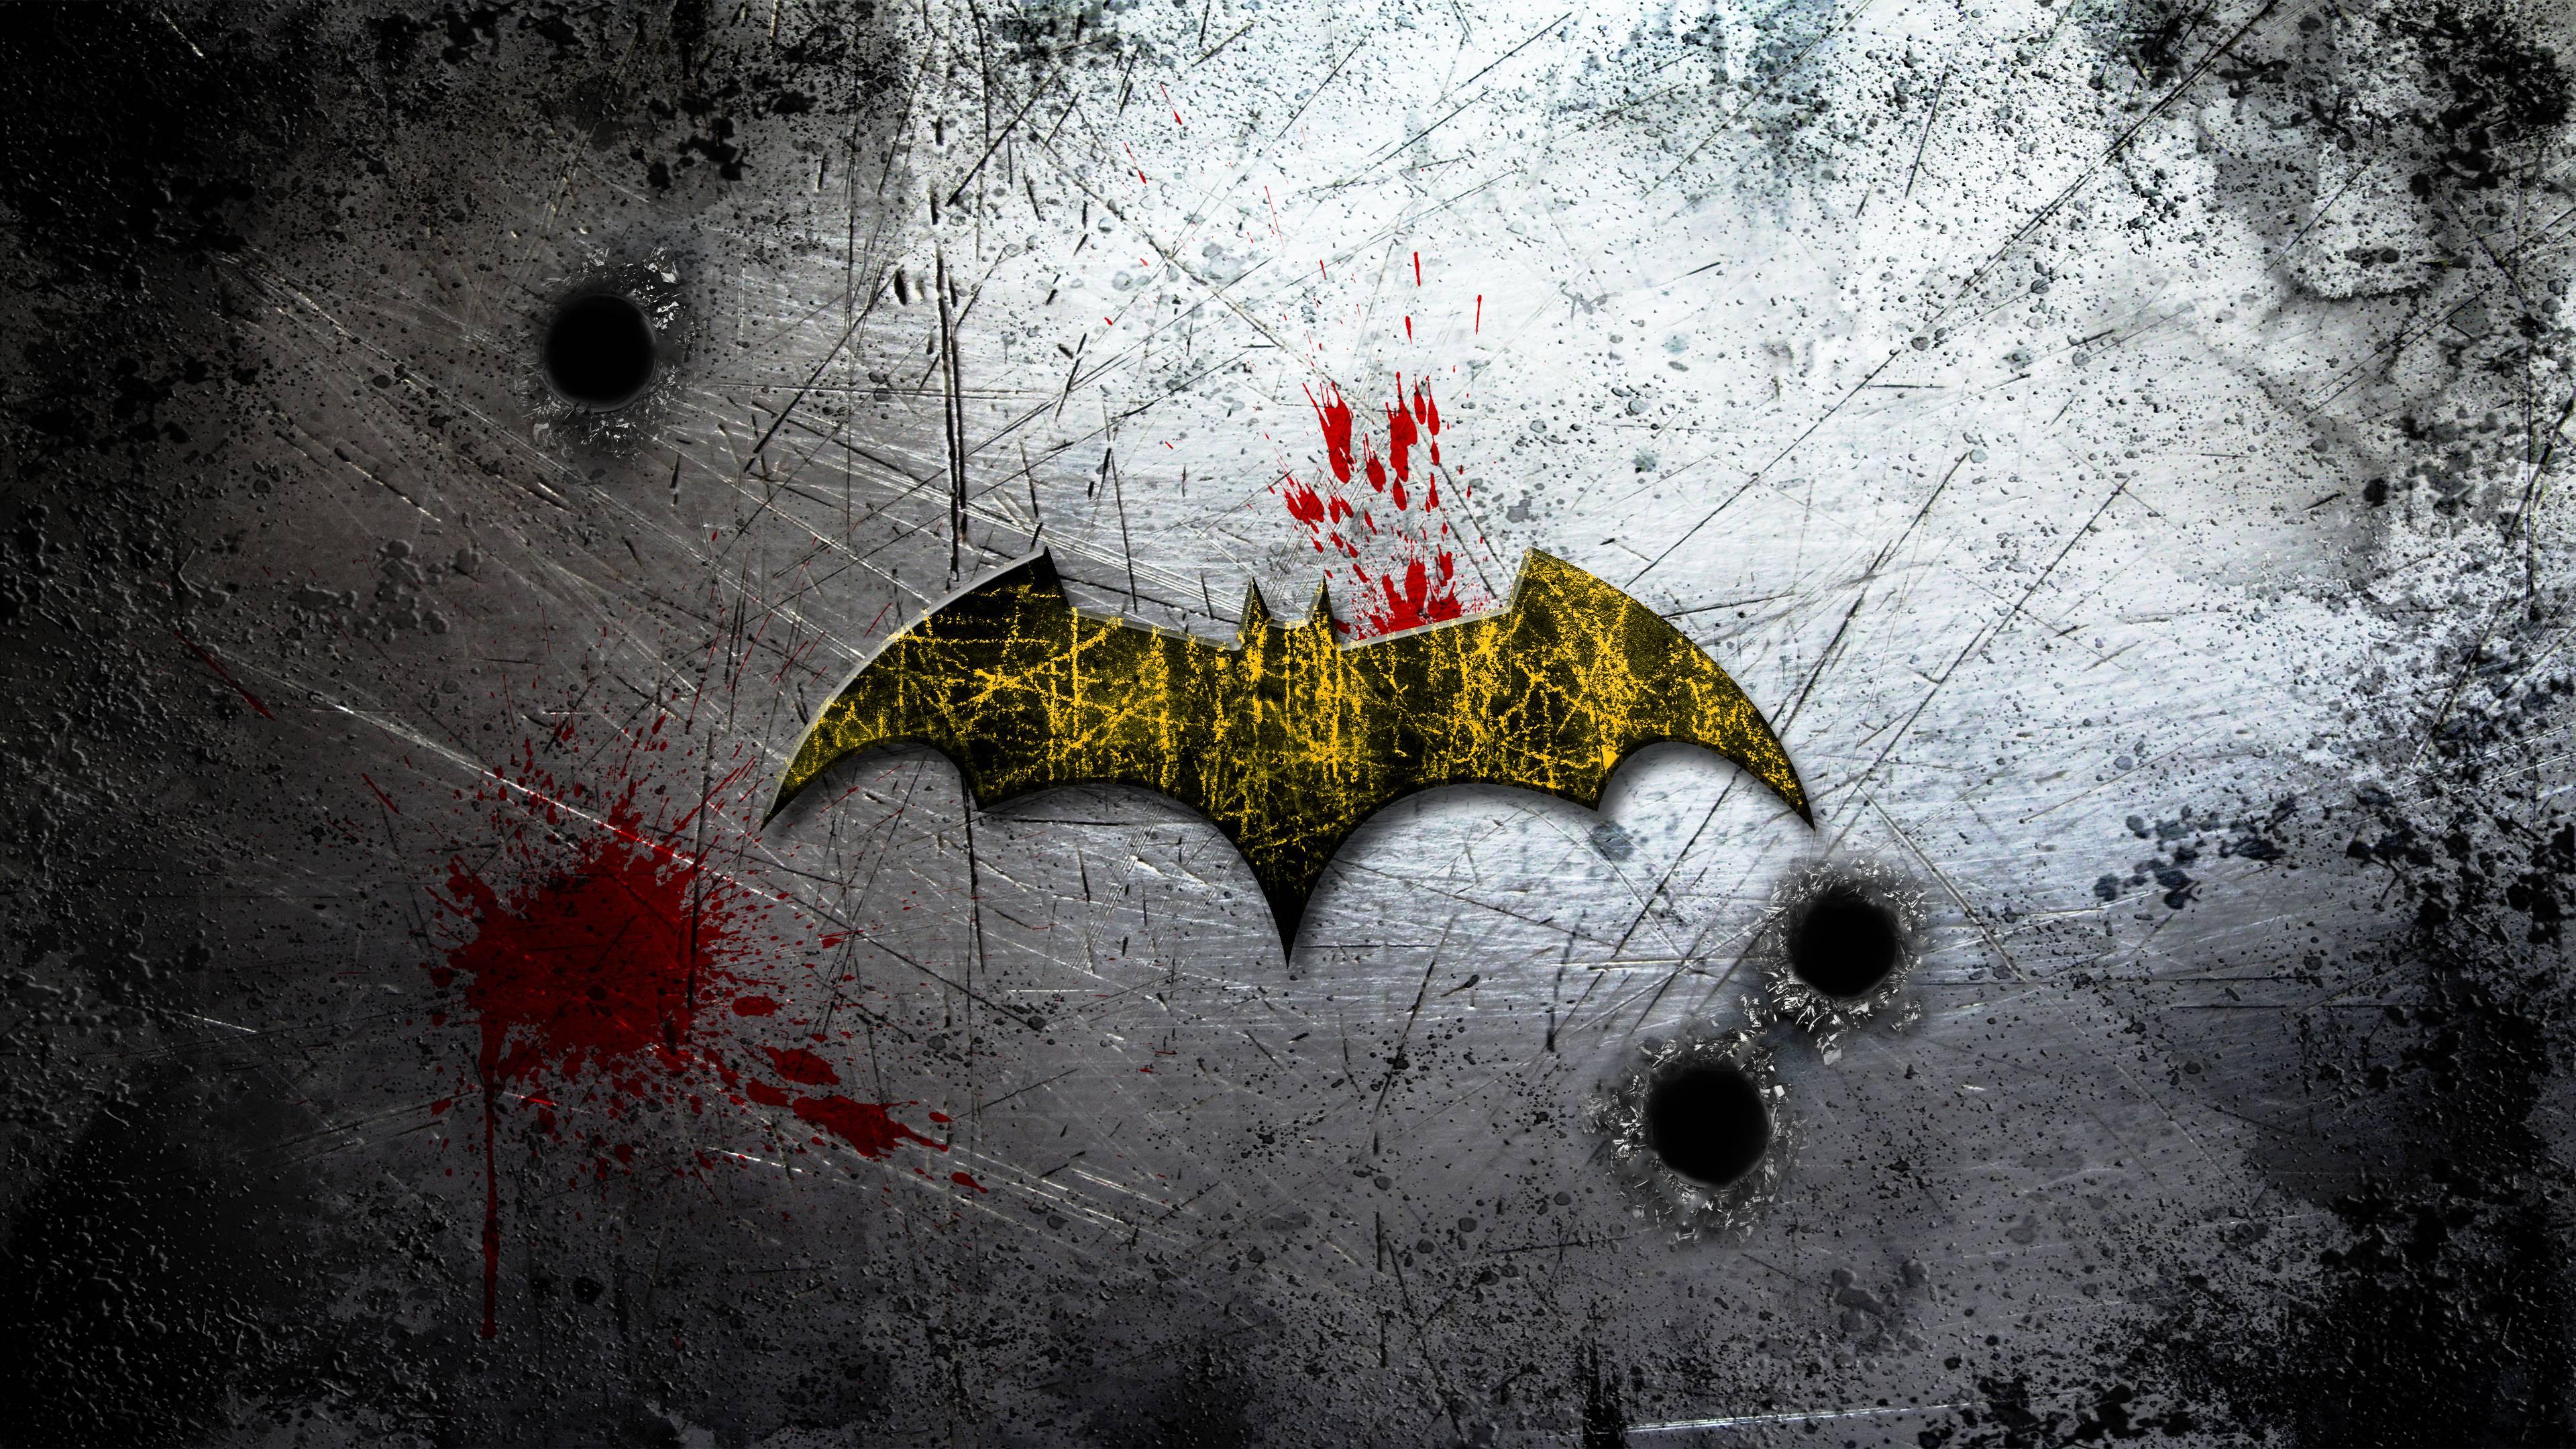 Falling In Reverse Logo Wallpaper Batman 4k Ultra Hd Wallpaper And Background Image